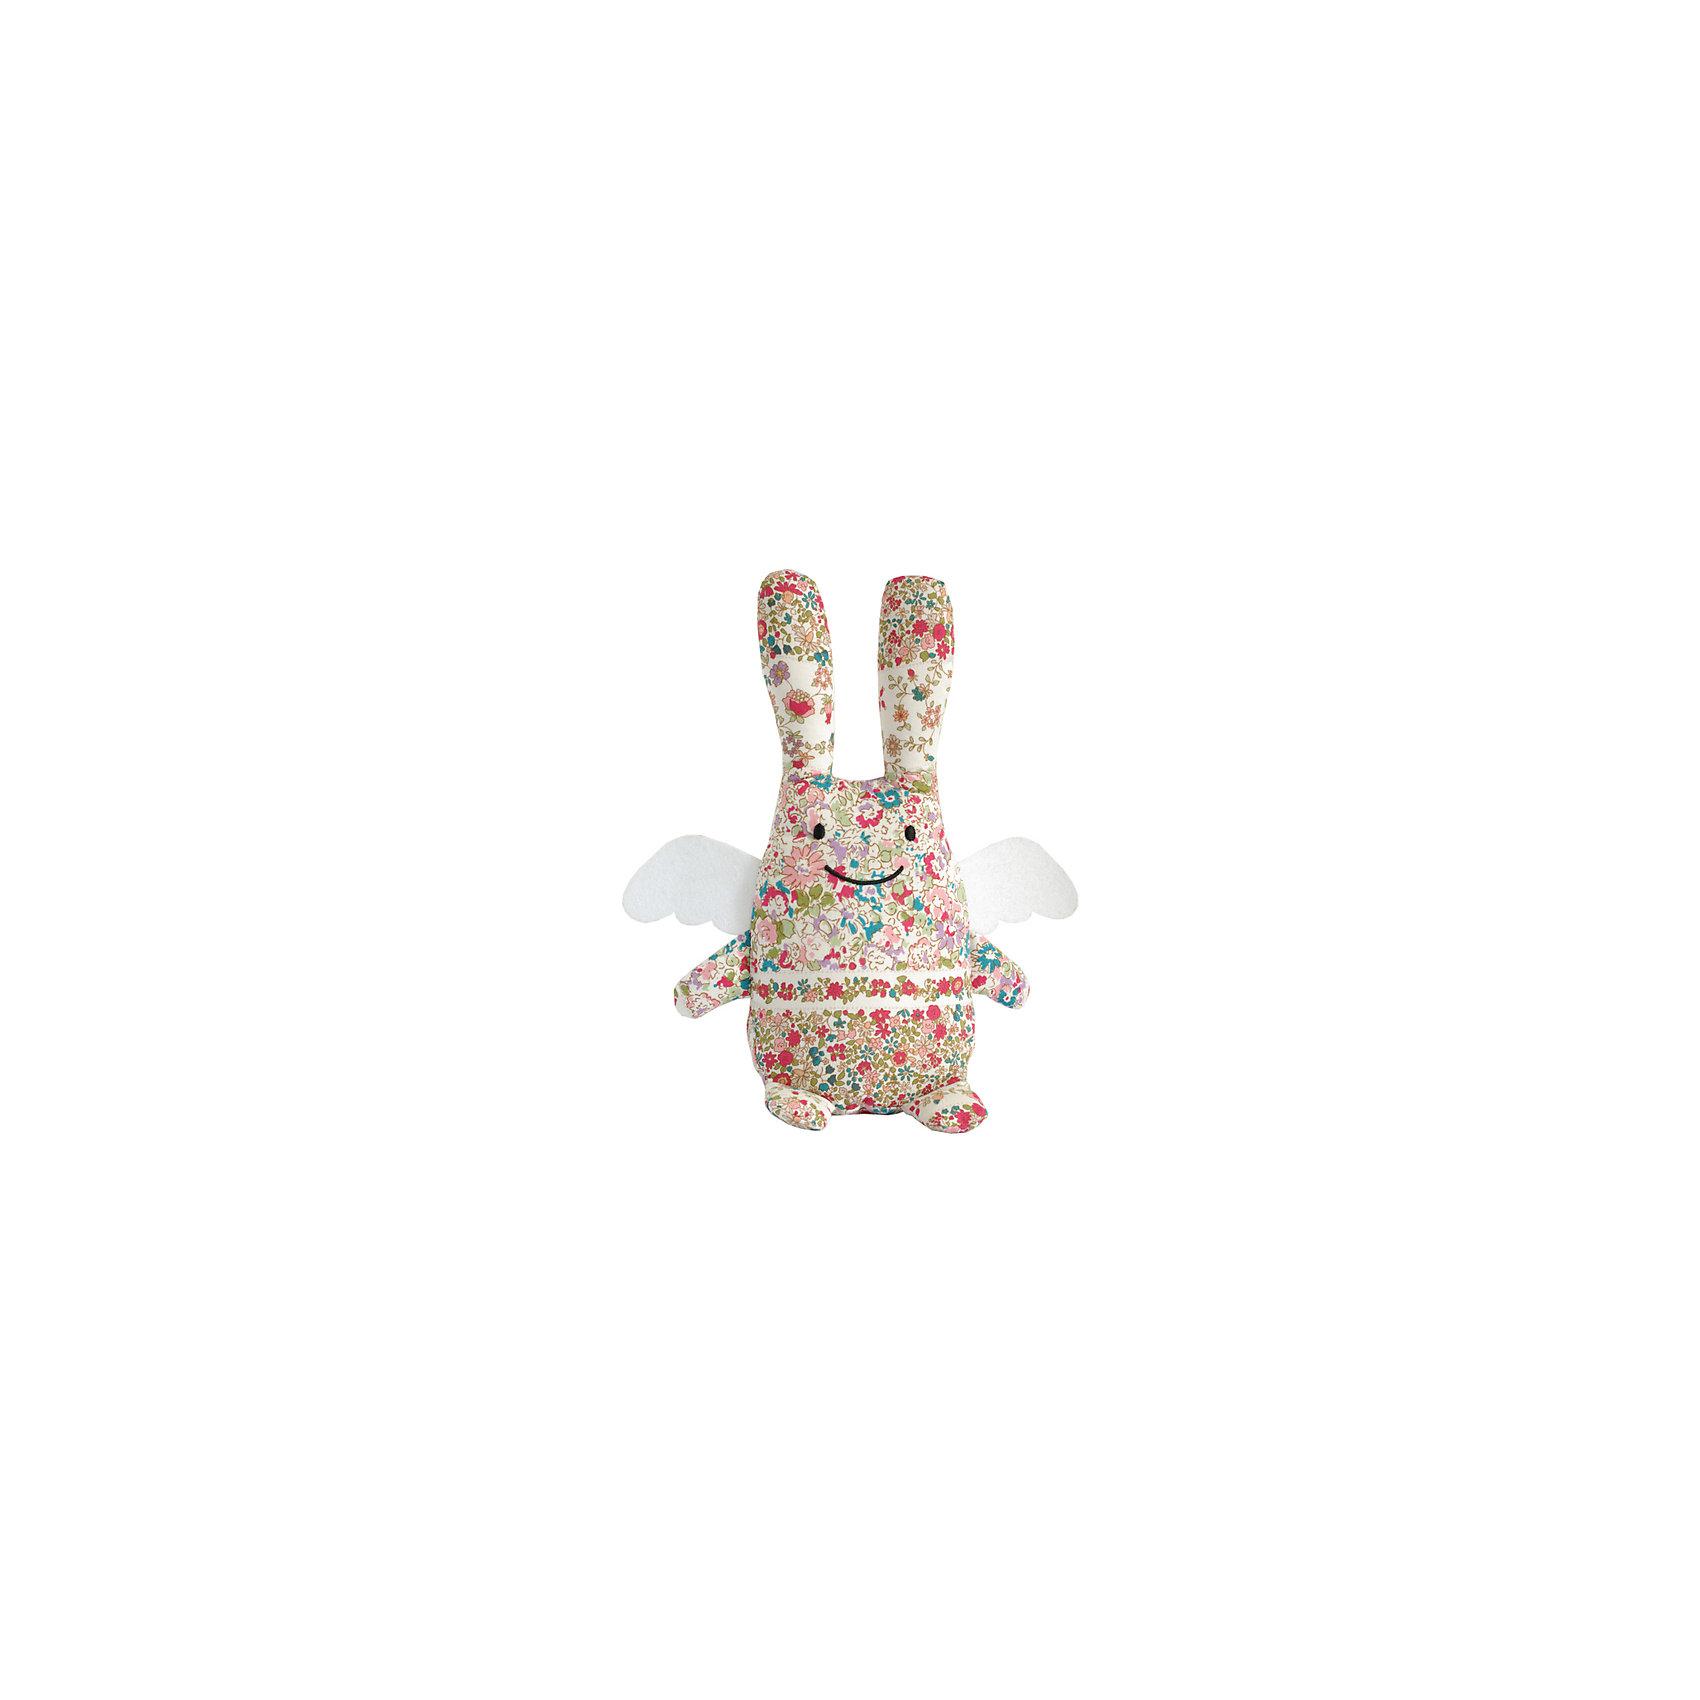 TROUSSELIER Мягкая игрушка Зайка с крылышками, музыкальный, 24см, Trousselier trousselier мягкая игрушка зайка с музыкой розовый 25см trousselier